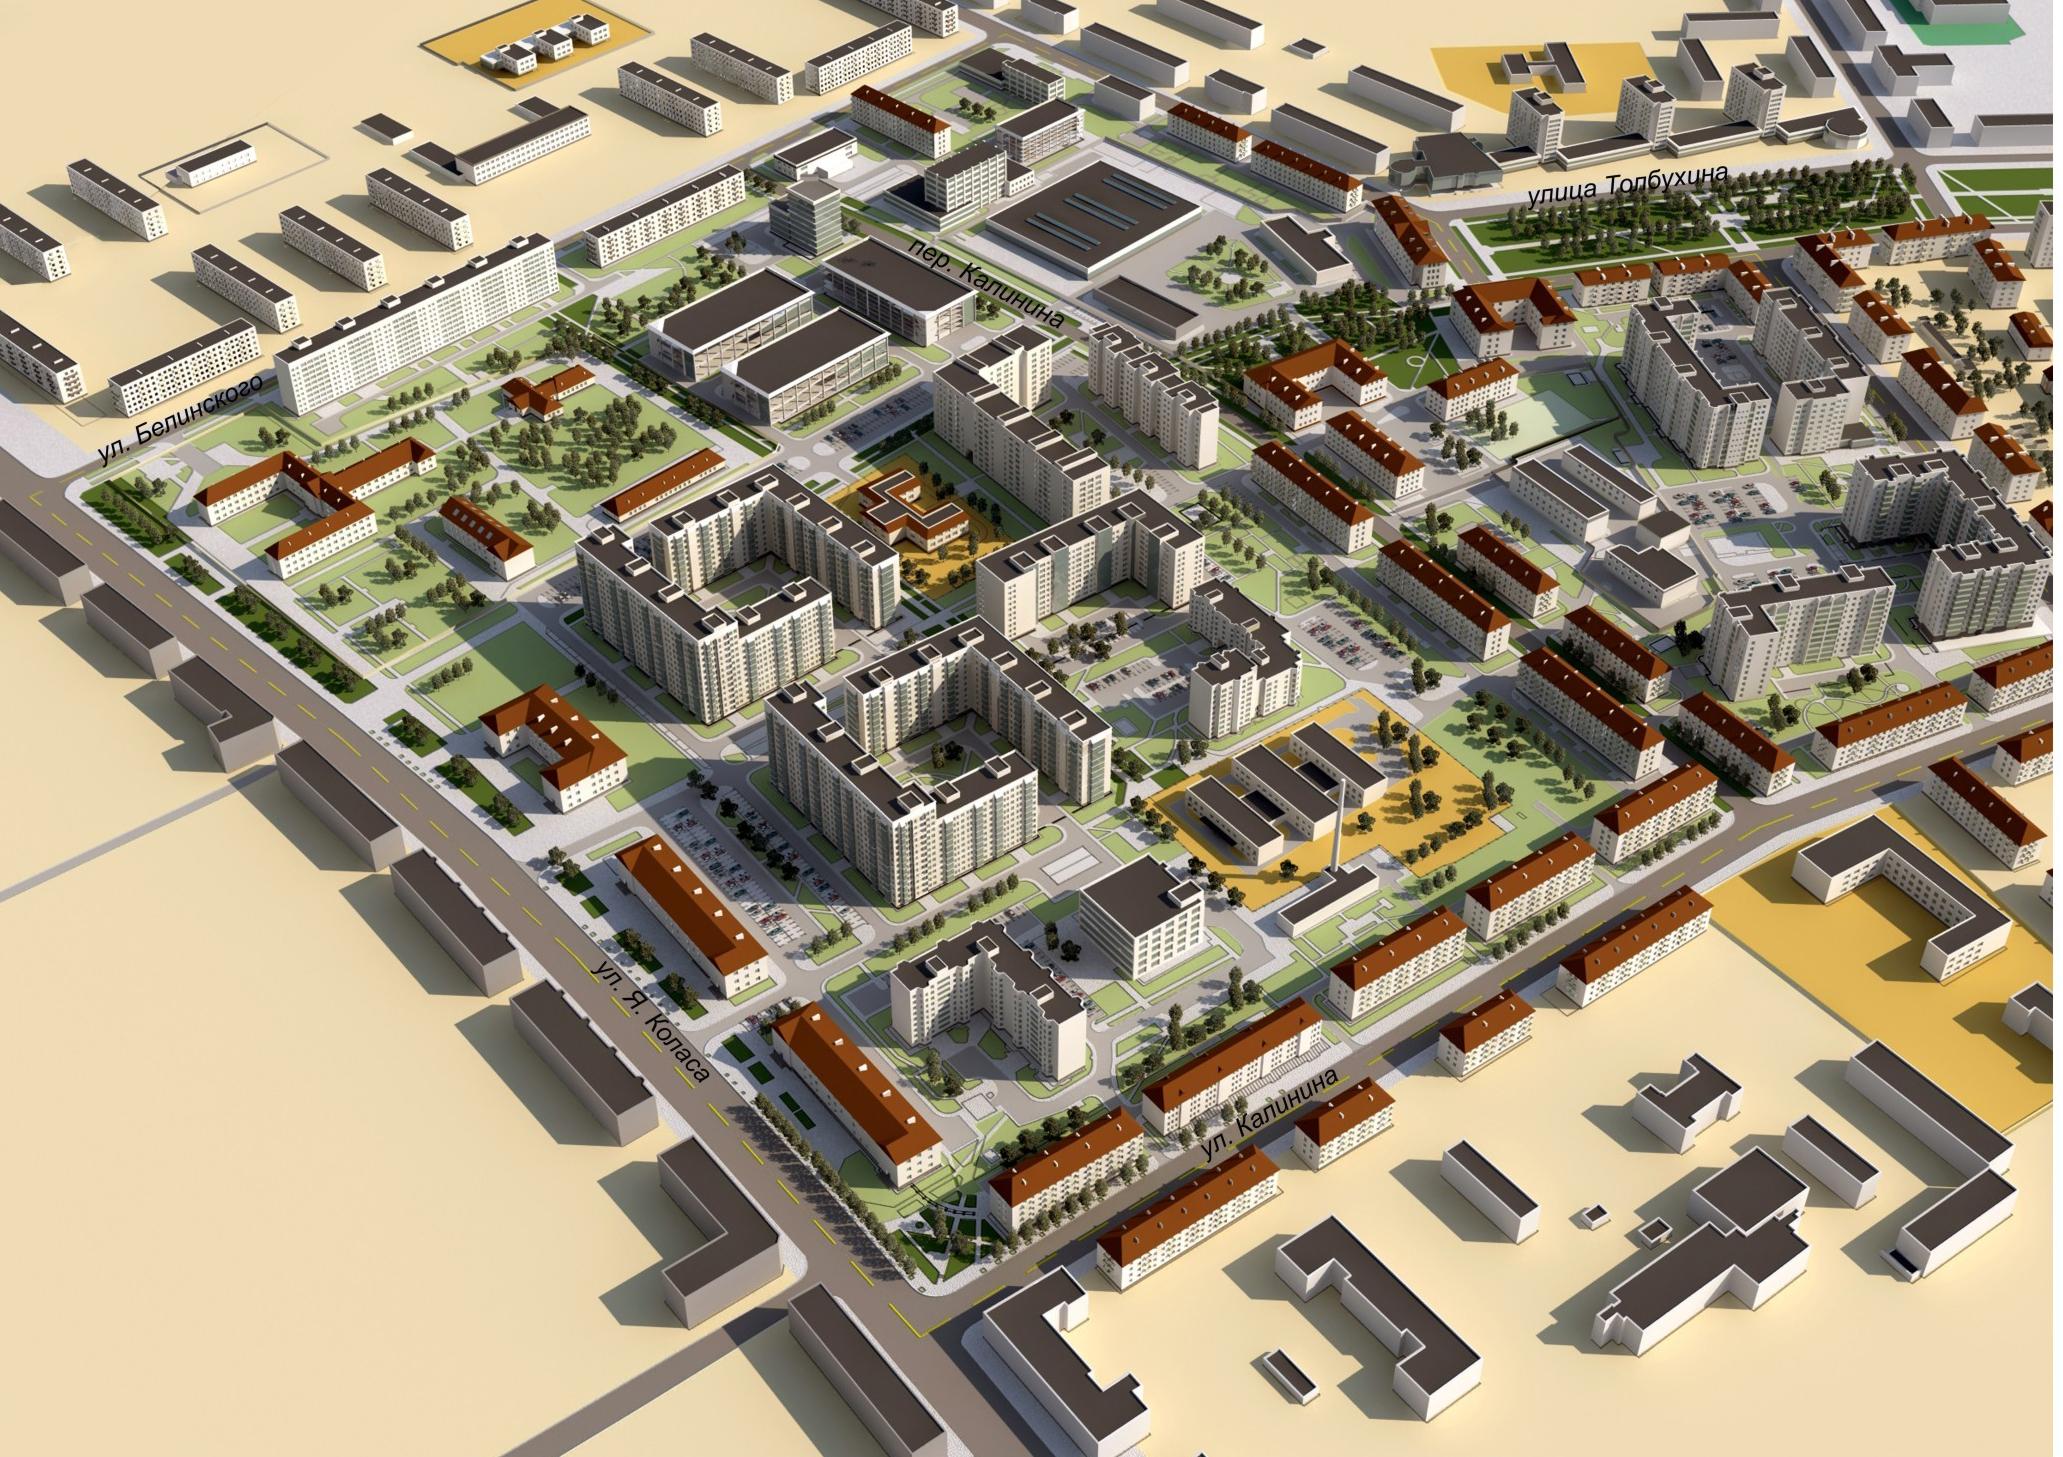 План застройки территории части жилым районом